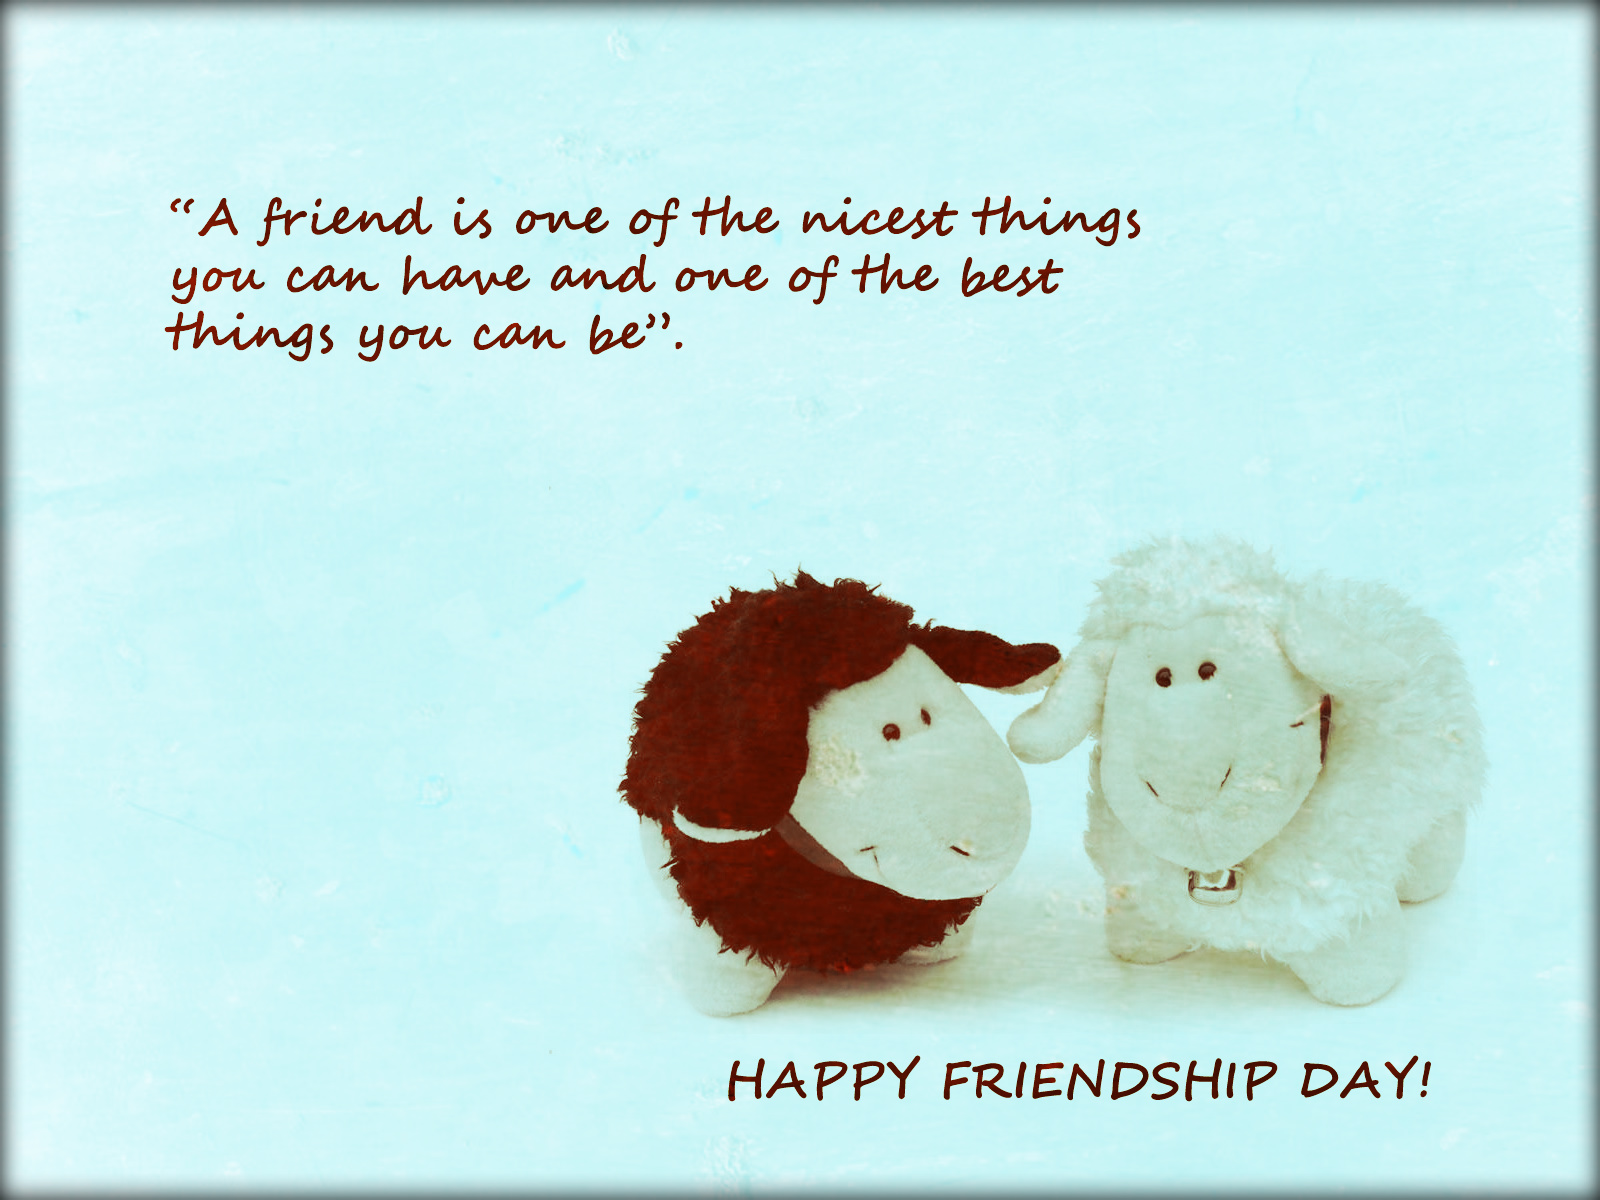 Good Night Baby Hd Wallpaper Funny Friendship Ecards Friendship Day Fun Photos